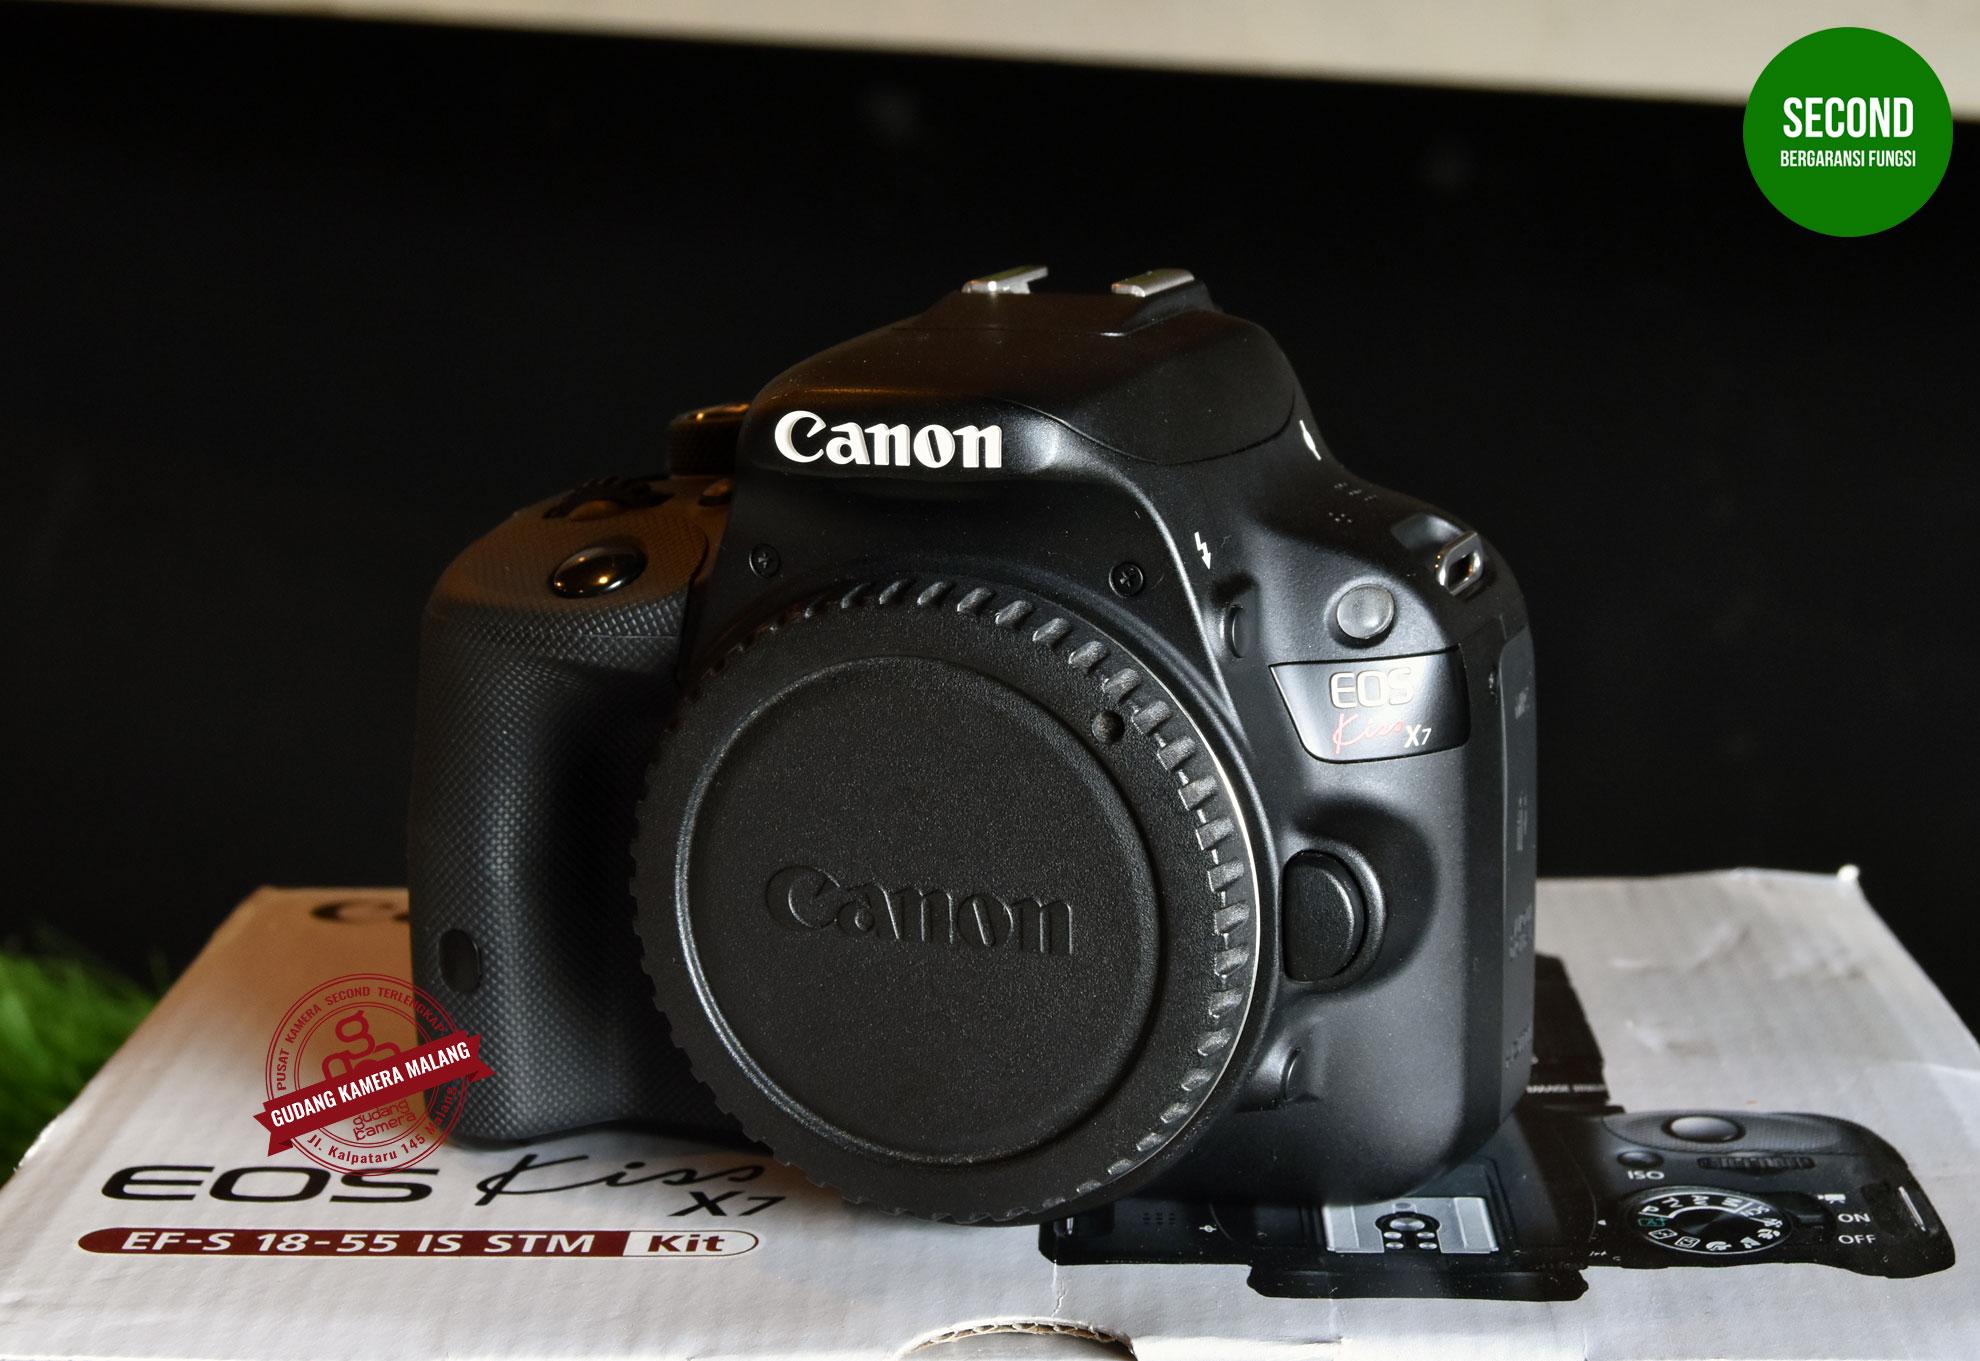 Jual Secondhand Canon Eos Kiss X7 100d Bo Sc6xxx Gudang Camera Lensa 18 55 Is Stm Kit Kamera M Mlg Tokopedia